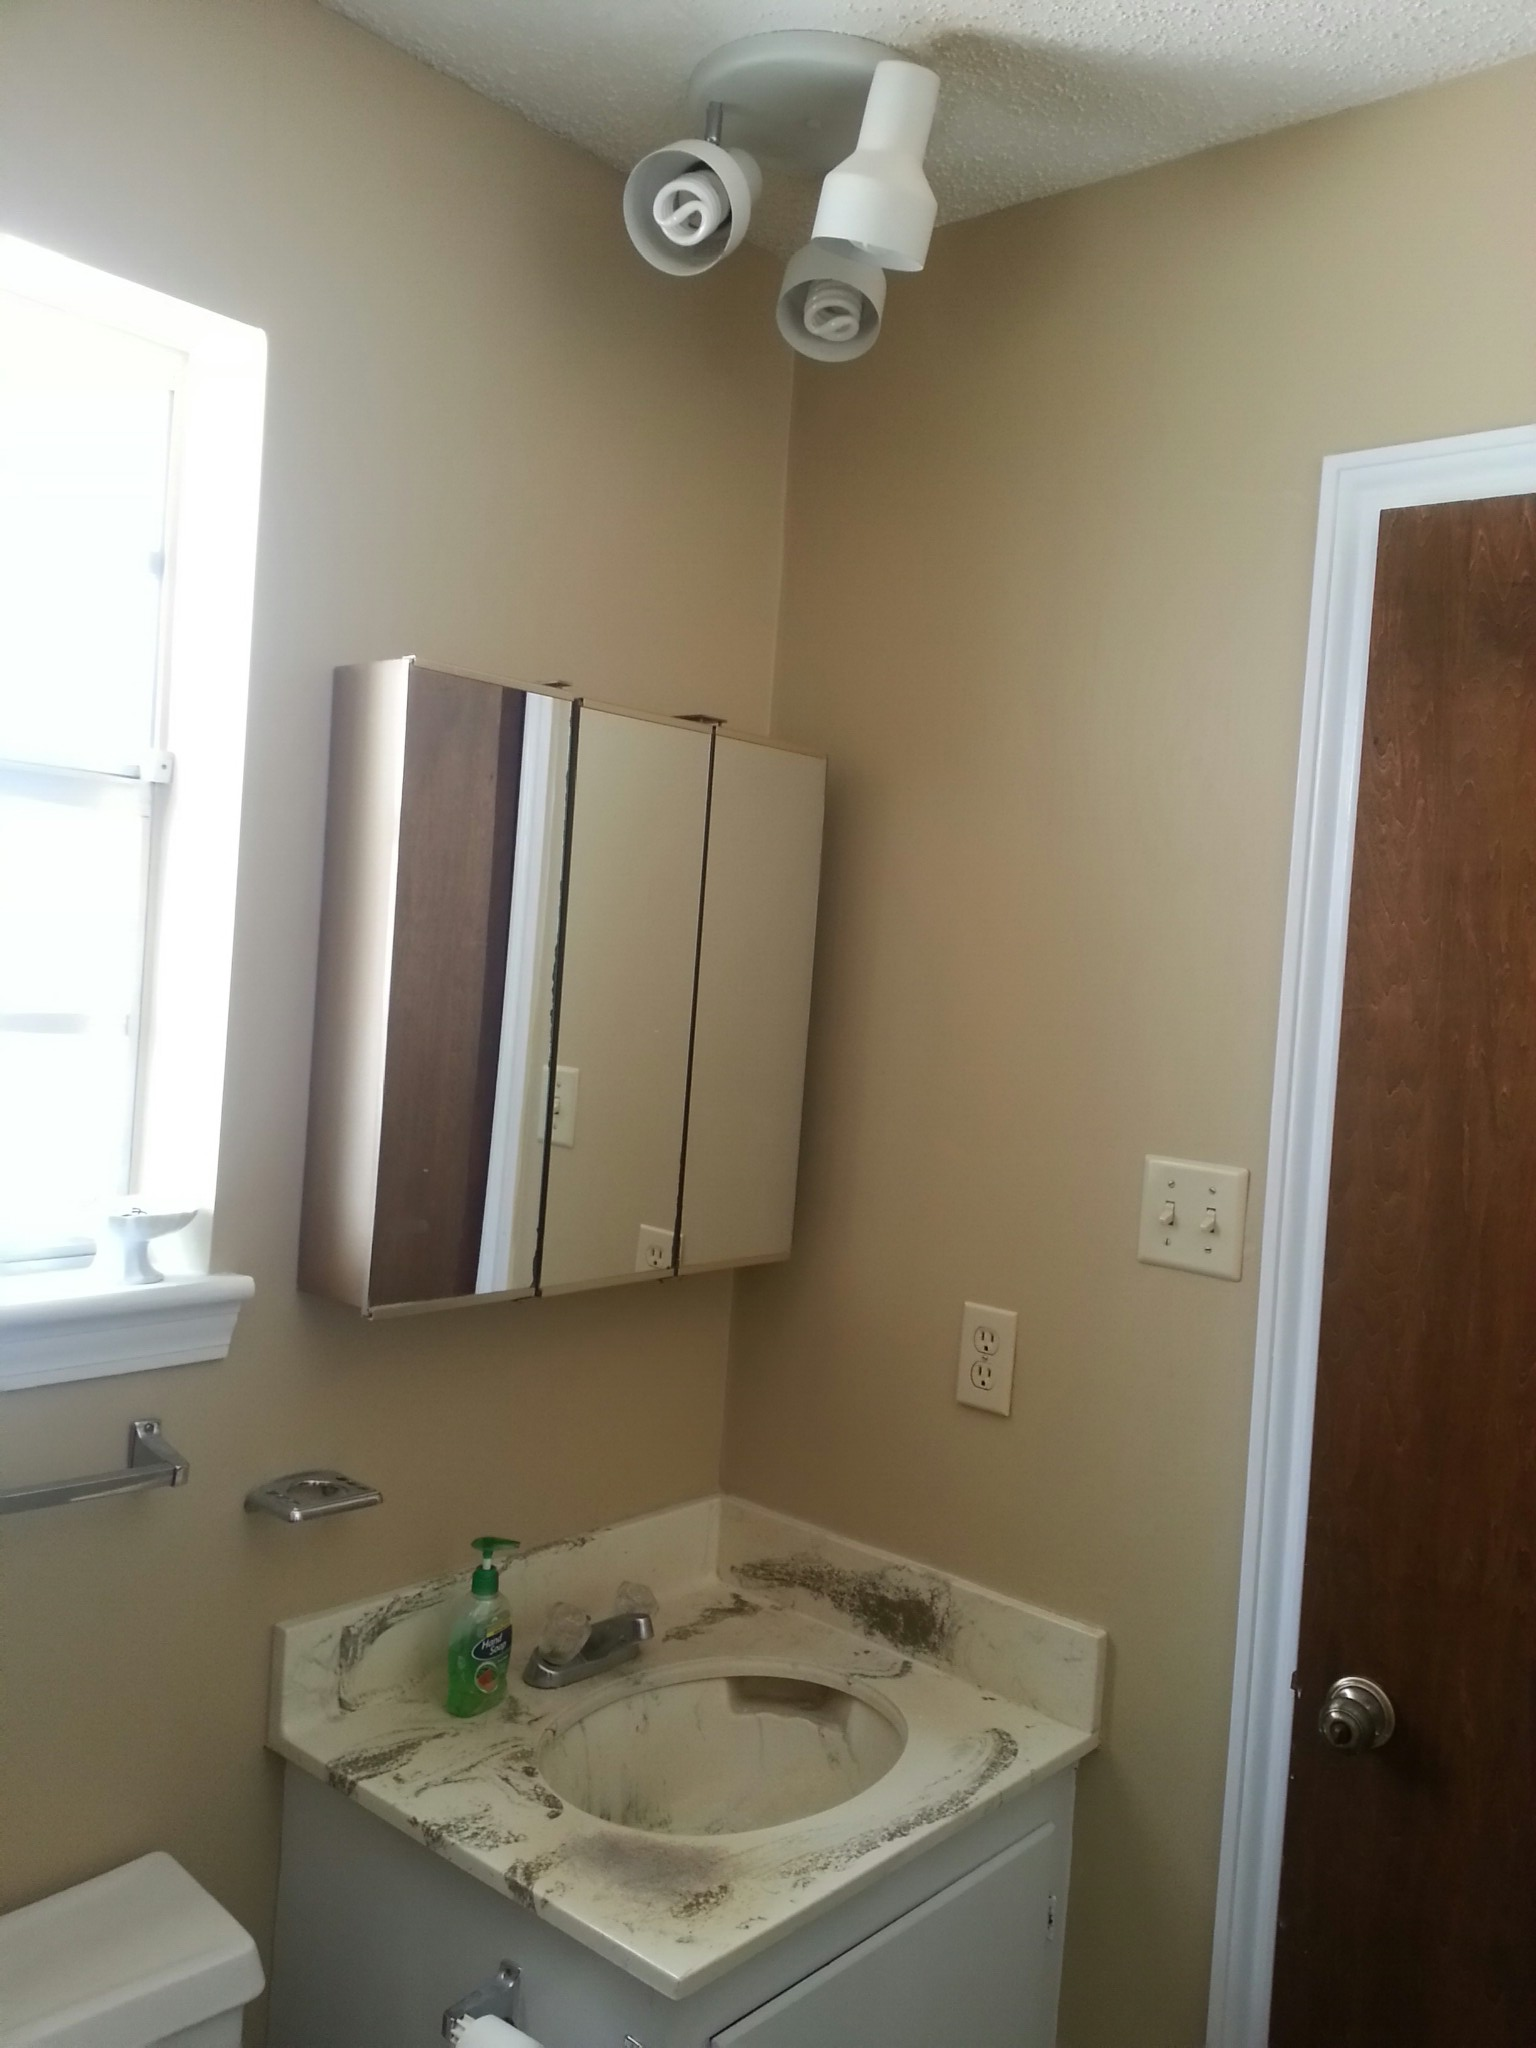 Diy master bathroom makeover the mirror better than for Master bathroom makeover